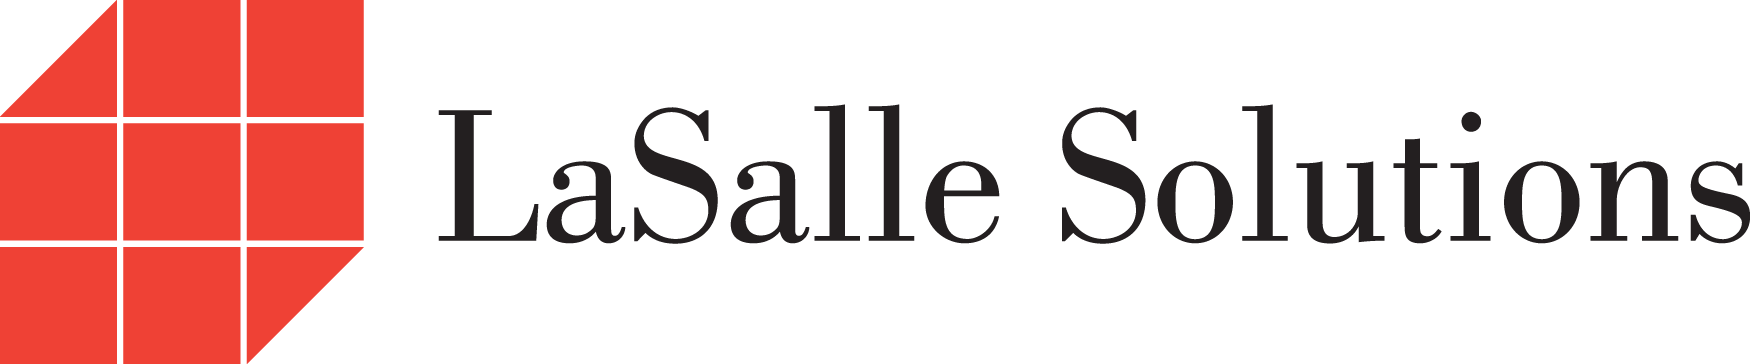 LaSalle Solutions Logo